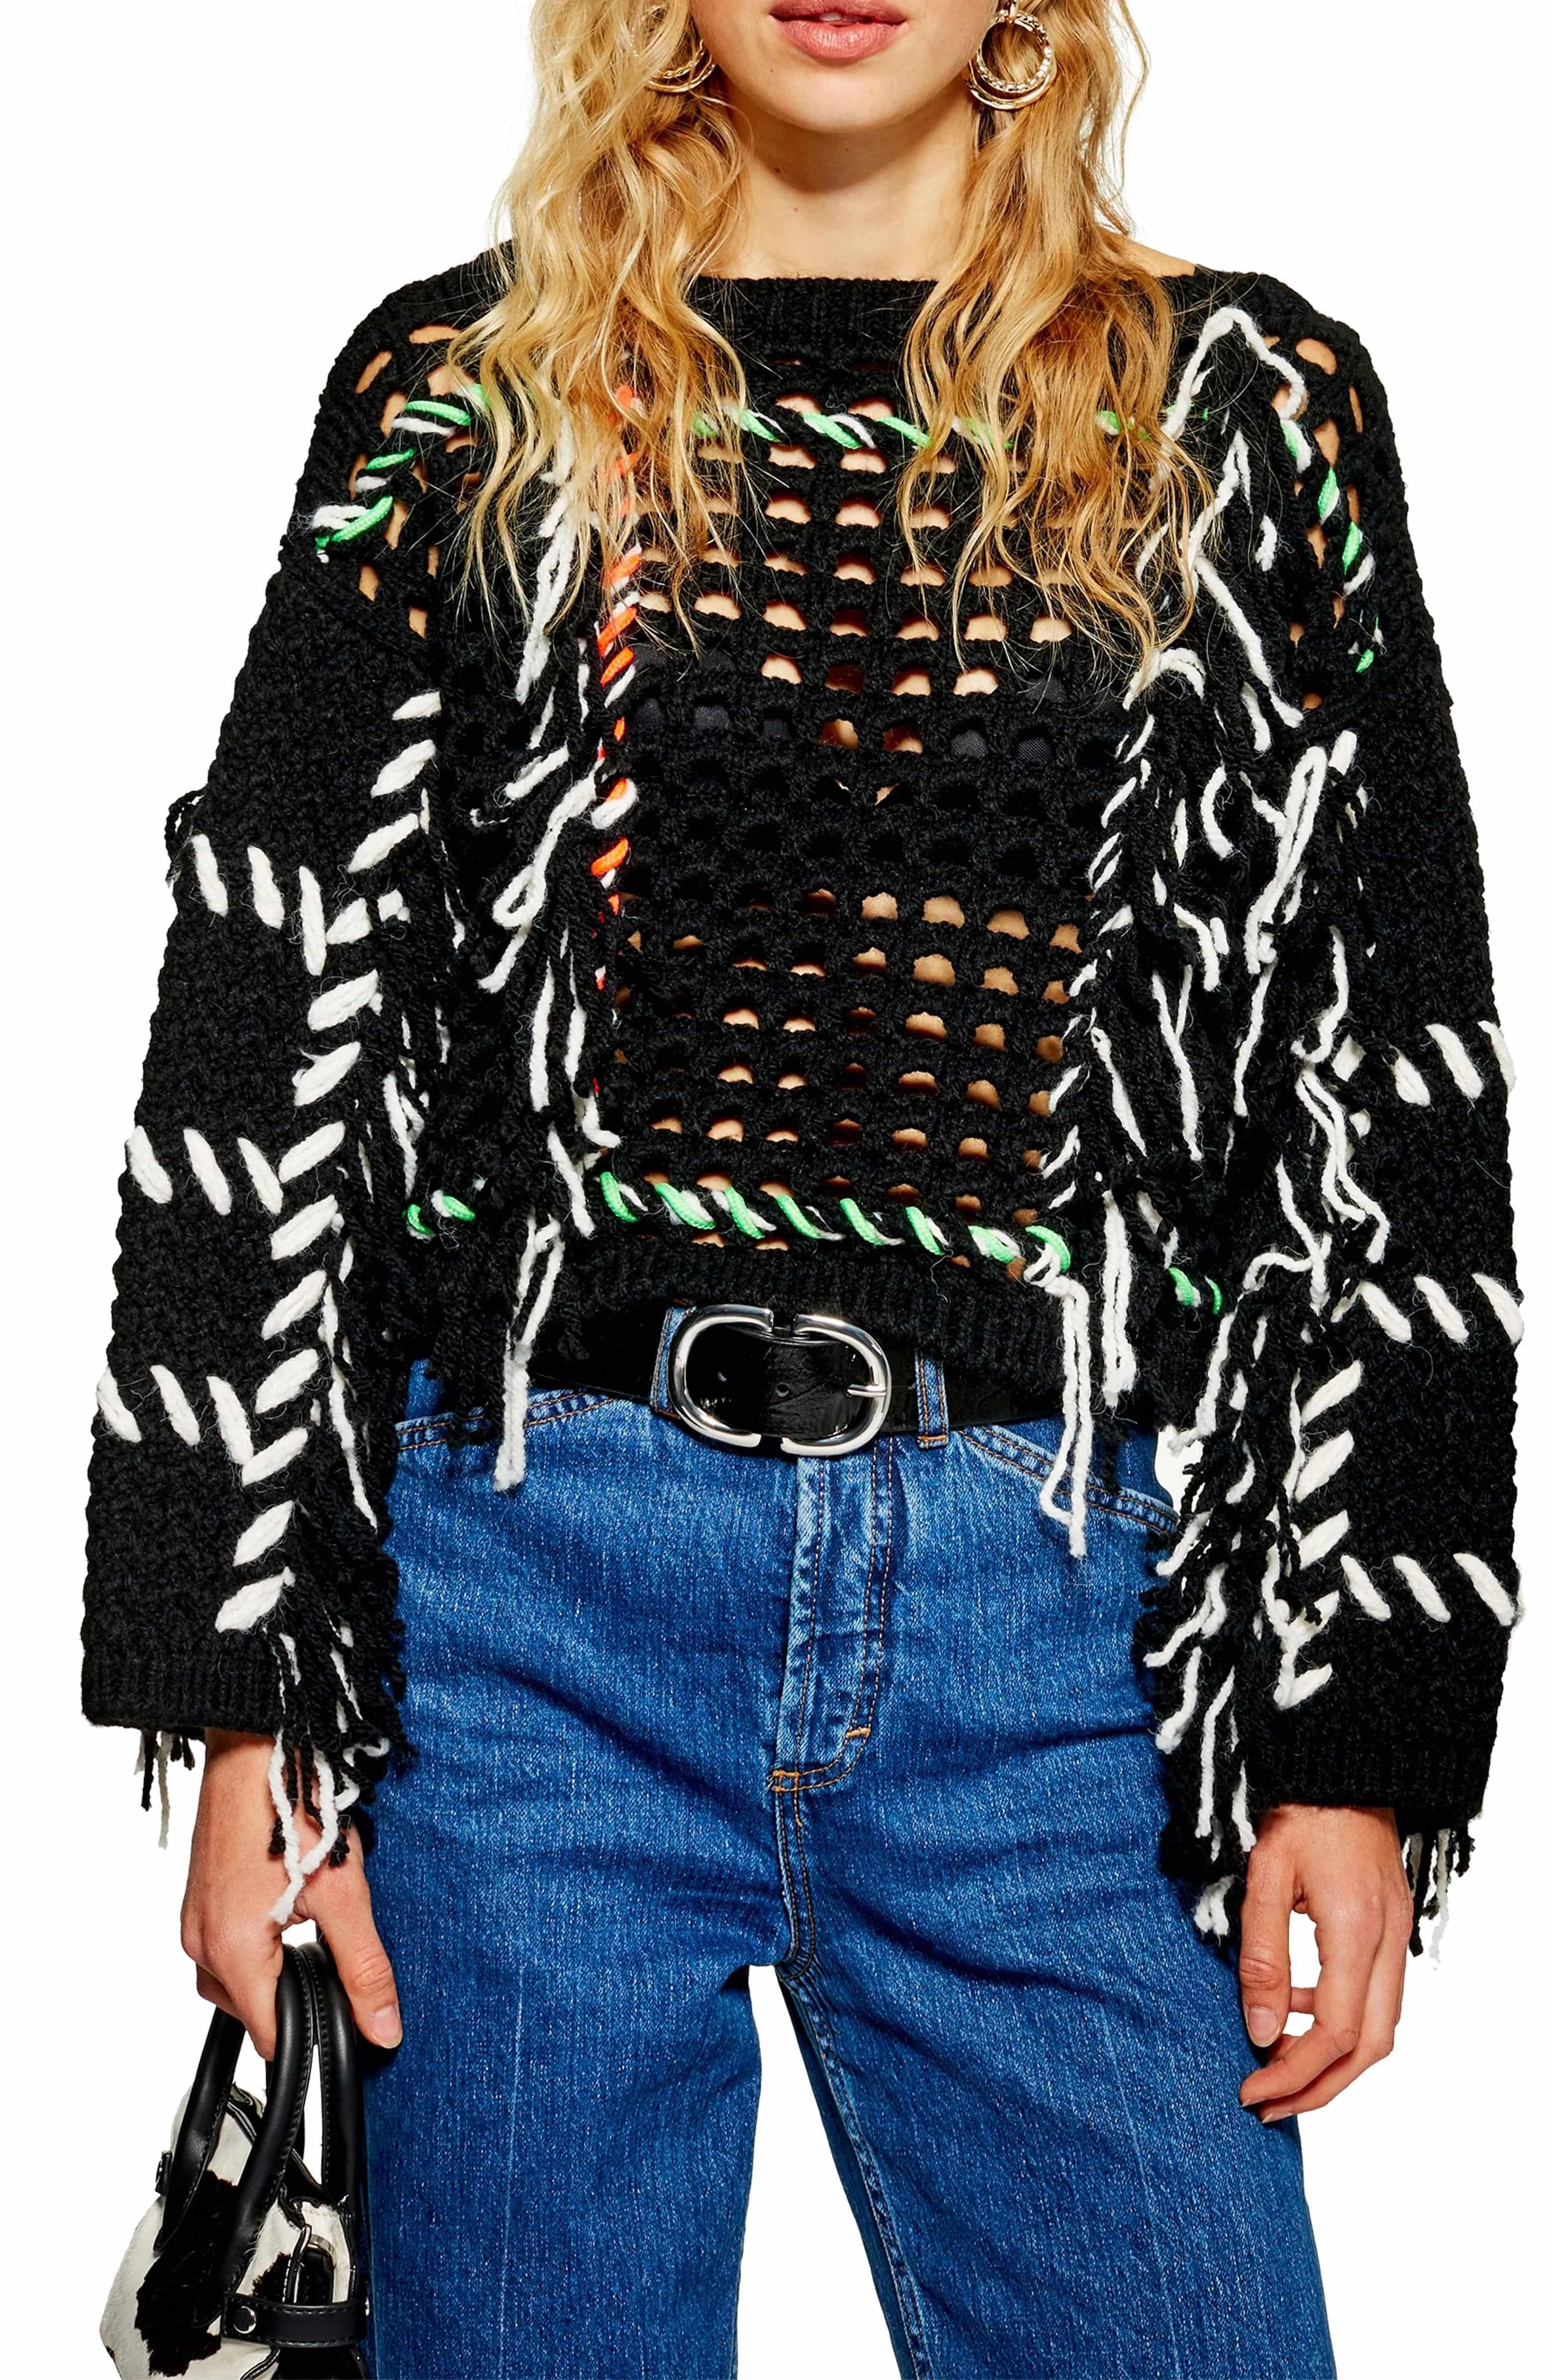 271ce63097d Fringe Crochet Sweater